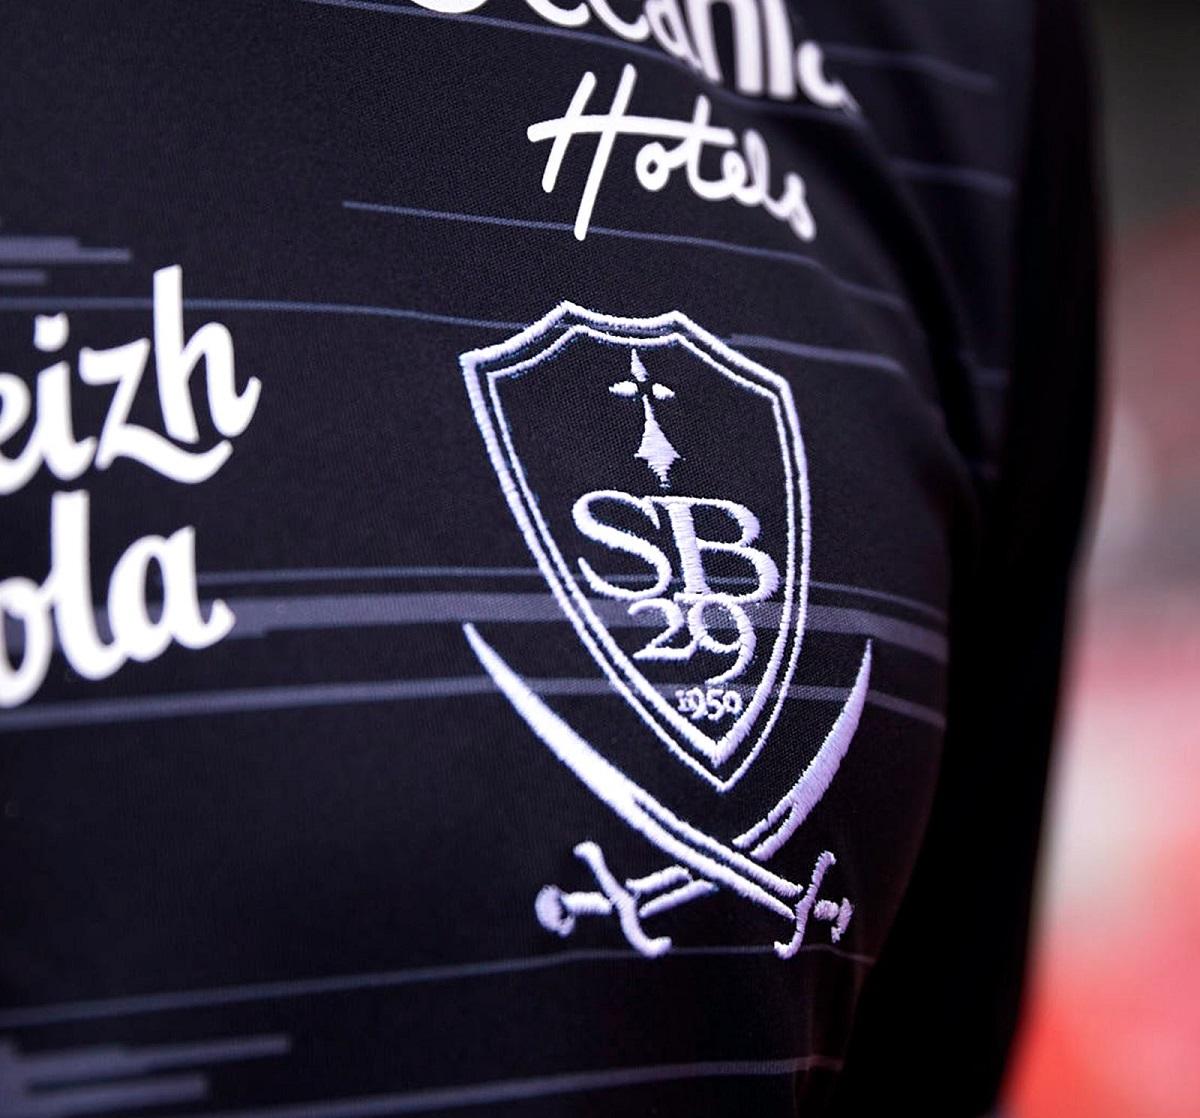 Camisas do Stade Brestois 2021-2022 Adidas